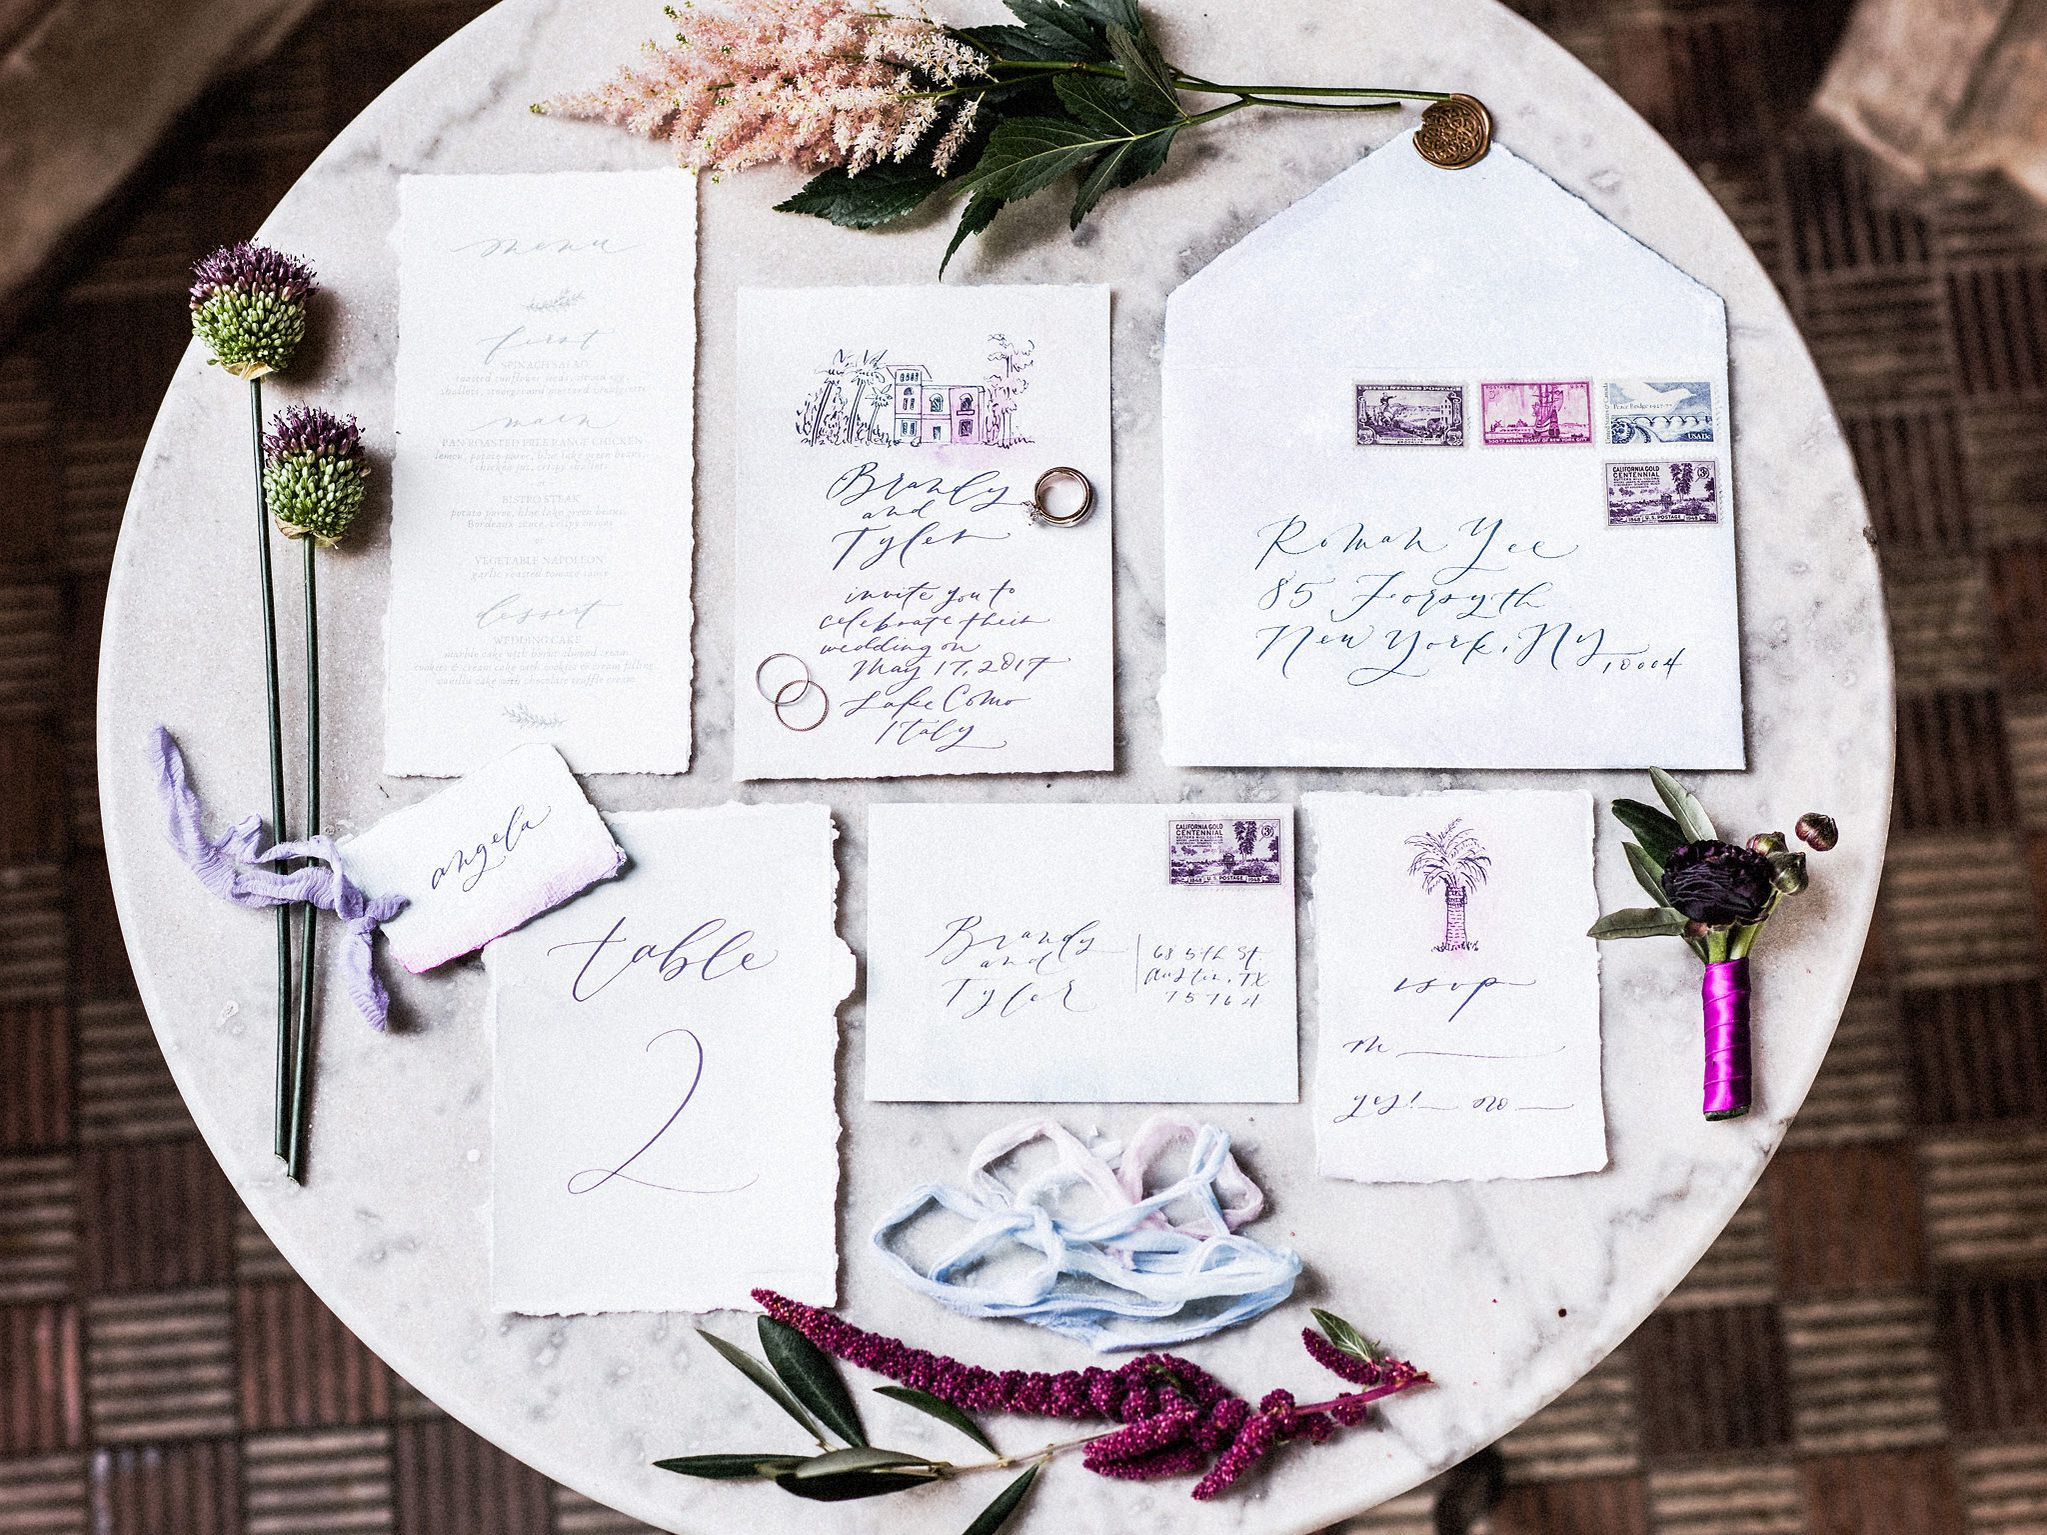 Create Wedding Invitations.10 Amazing Wedding Invitations Websites To Create Your Own Design